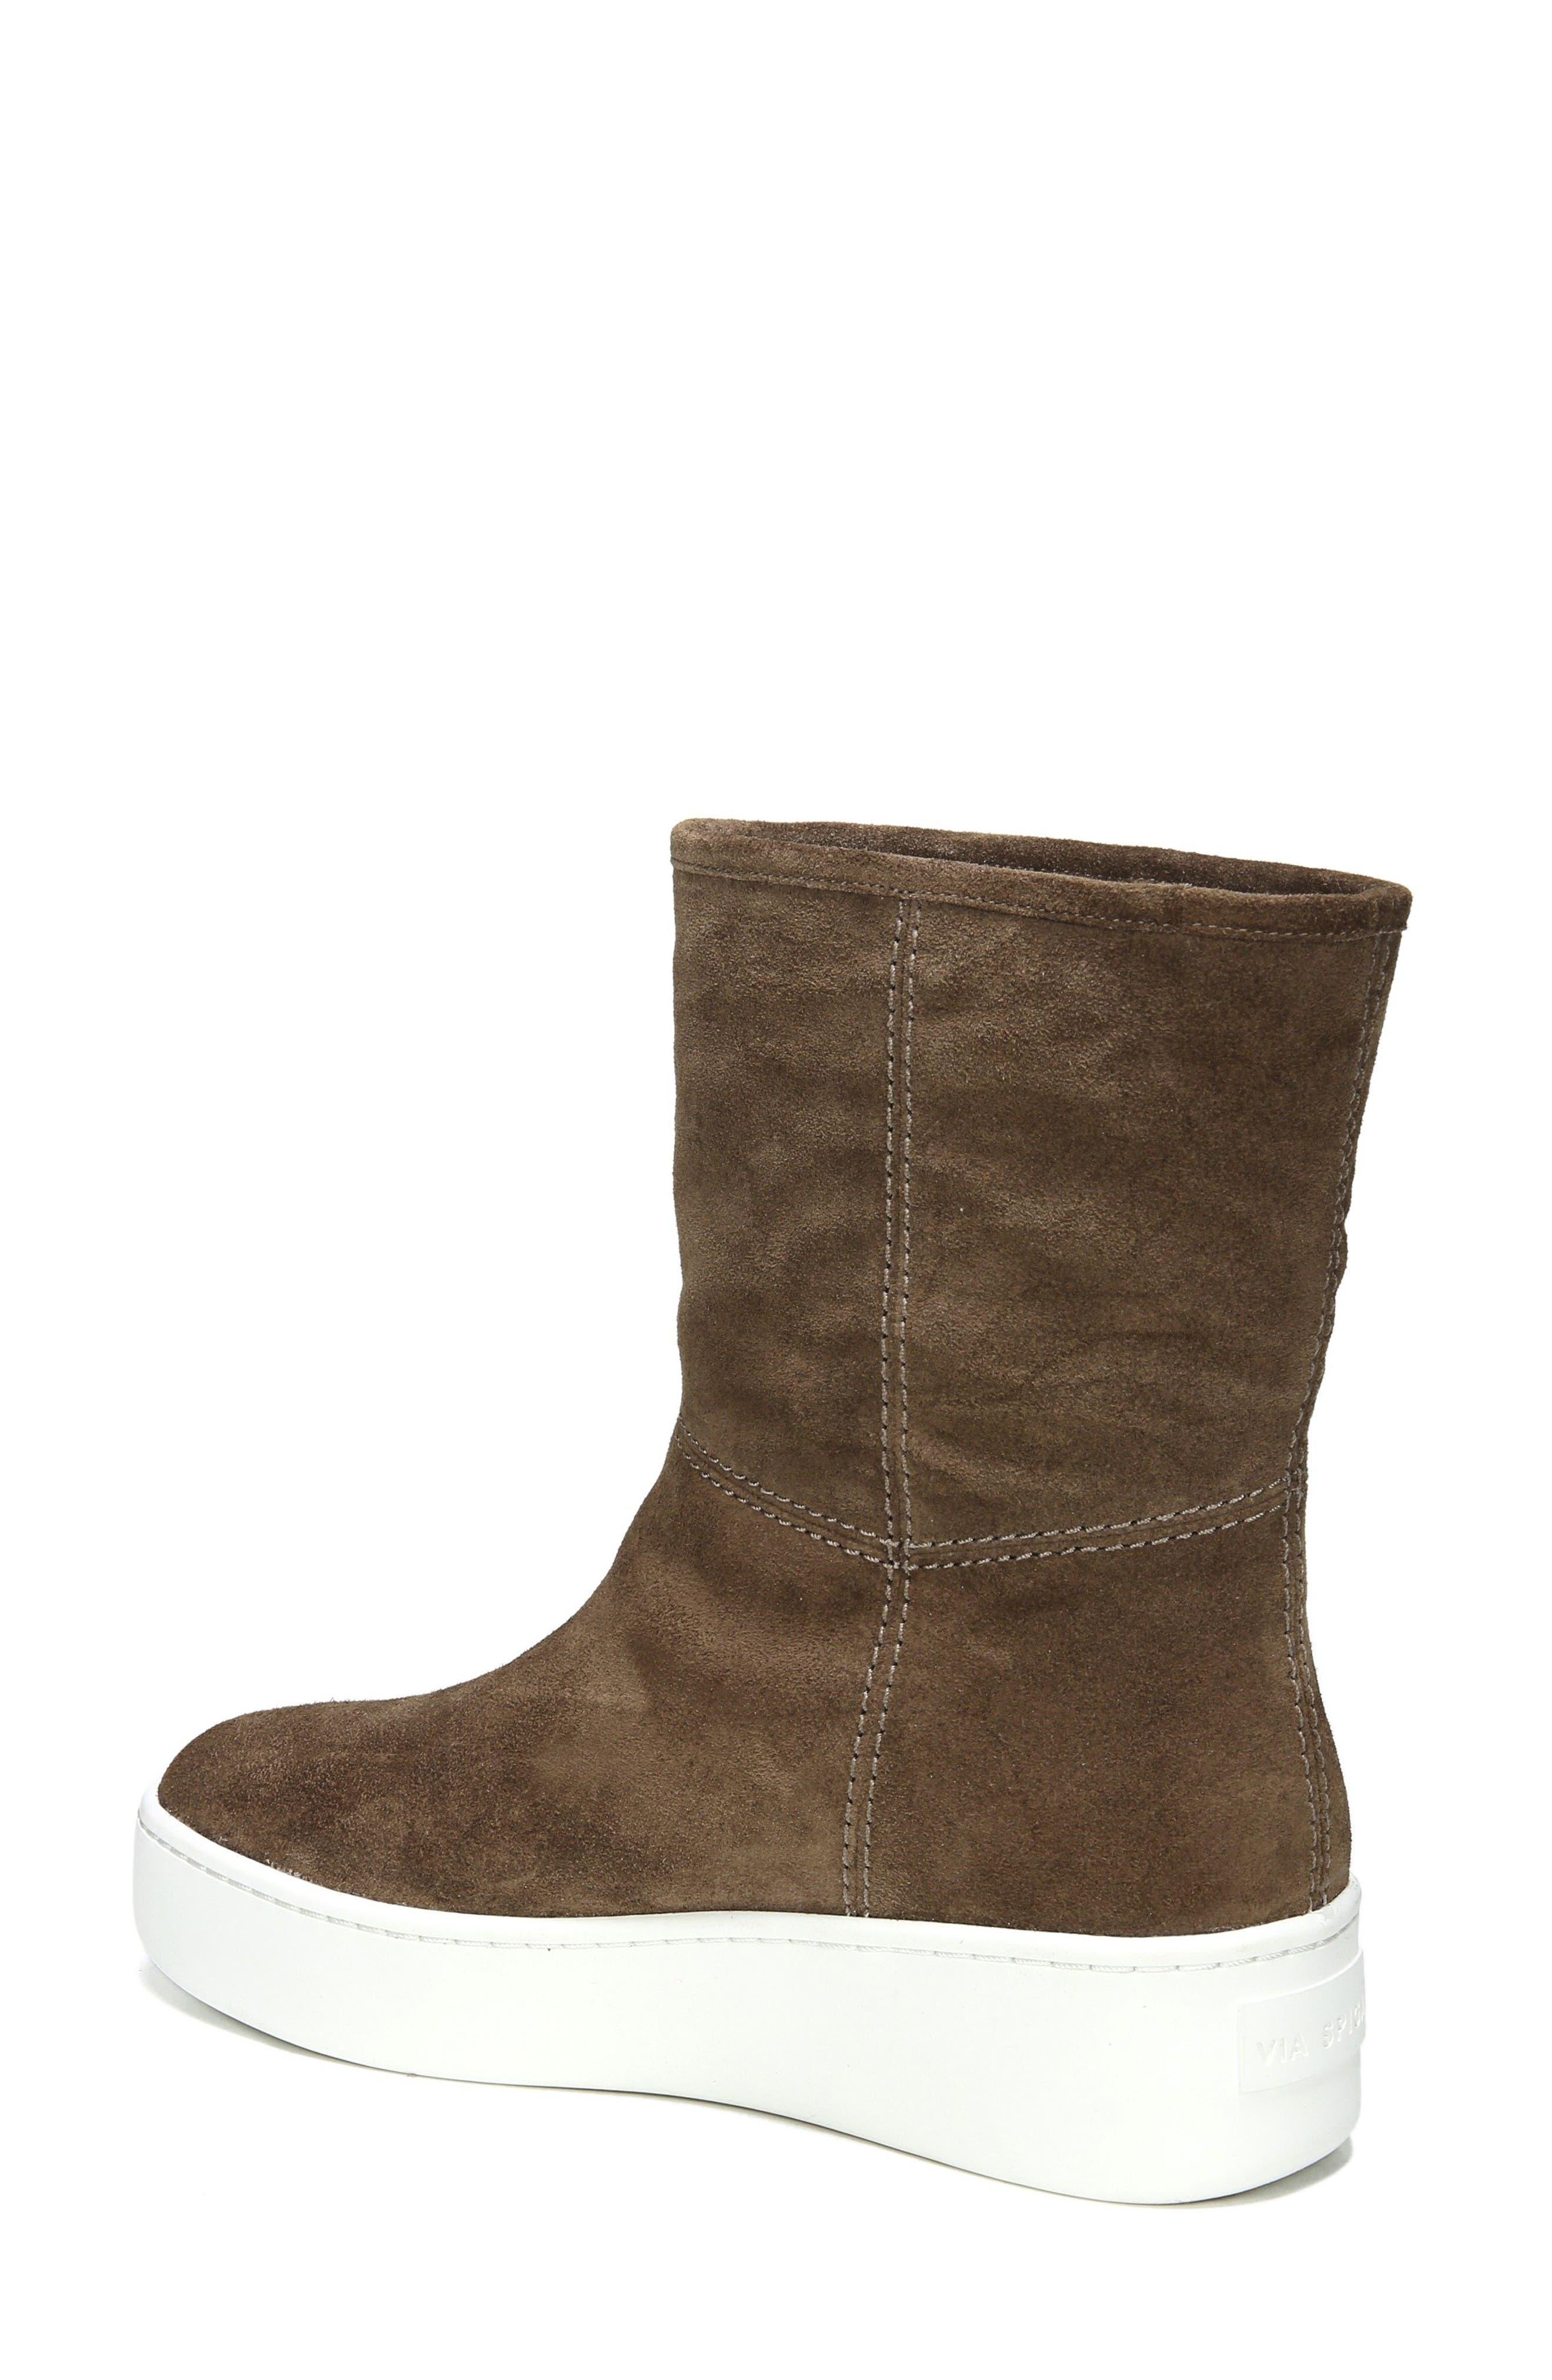 Elona Genuine Shearling Lined Sneaker Boot,                             Alternate thumbnail 2, color,                             Bark Suede